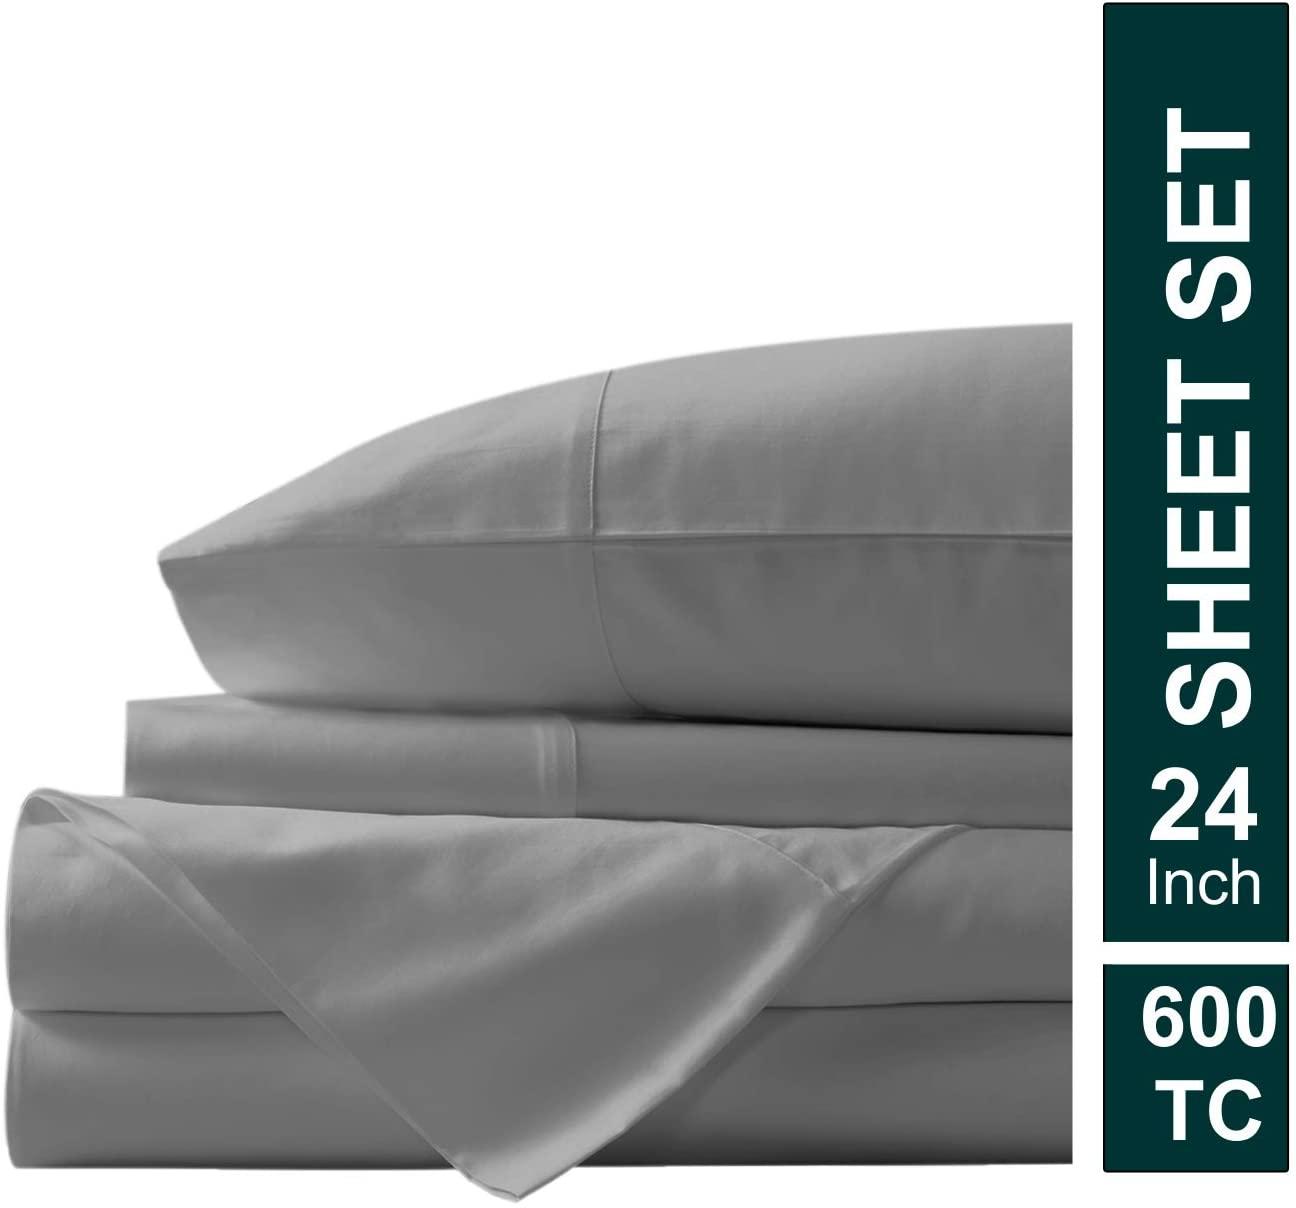 Meraki Linen Presents 4 PC Sheet Set 100% Egyptian Cotton 600 TC Premium Sheet Set, Luxurious Feel Italian Finish Long Staple Comfortable bedsheet Set Comes with 24